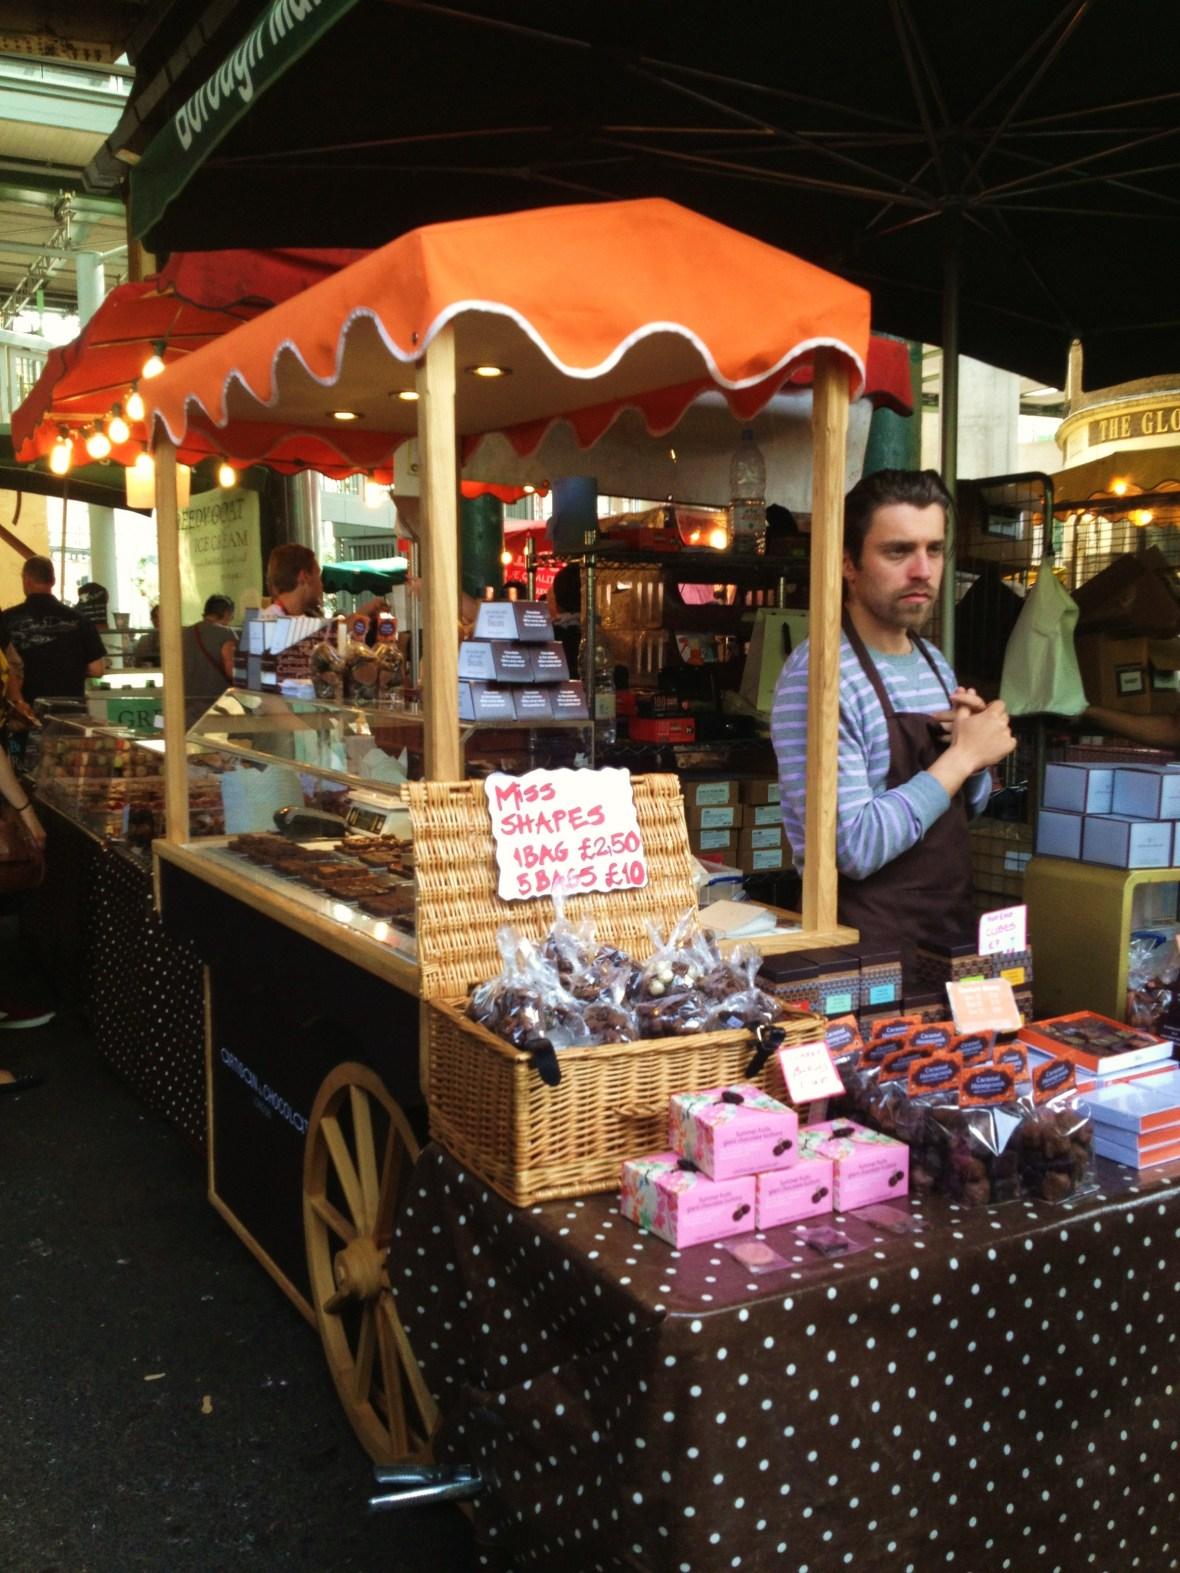 MoMo & Coco's Guide to London's Borough Market Desserts - Artisan du Chocolat